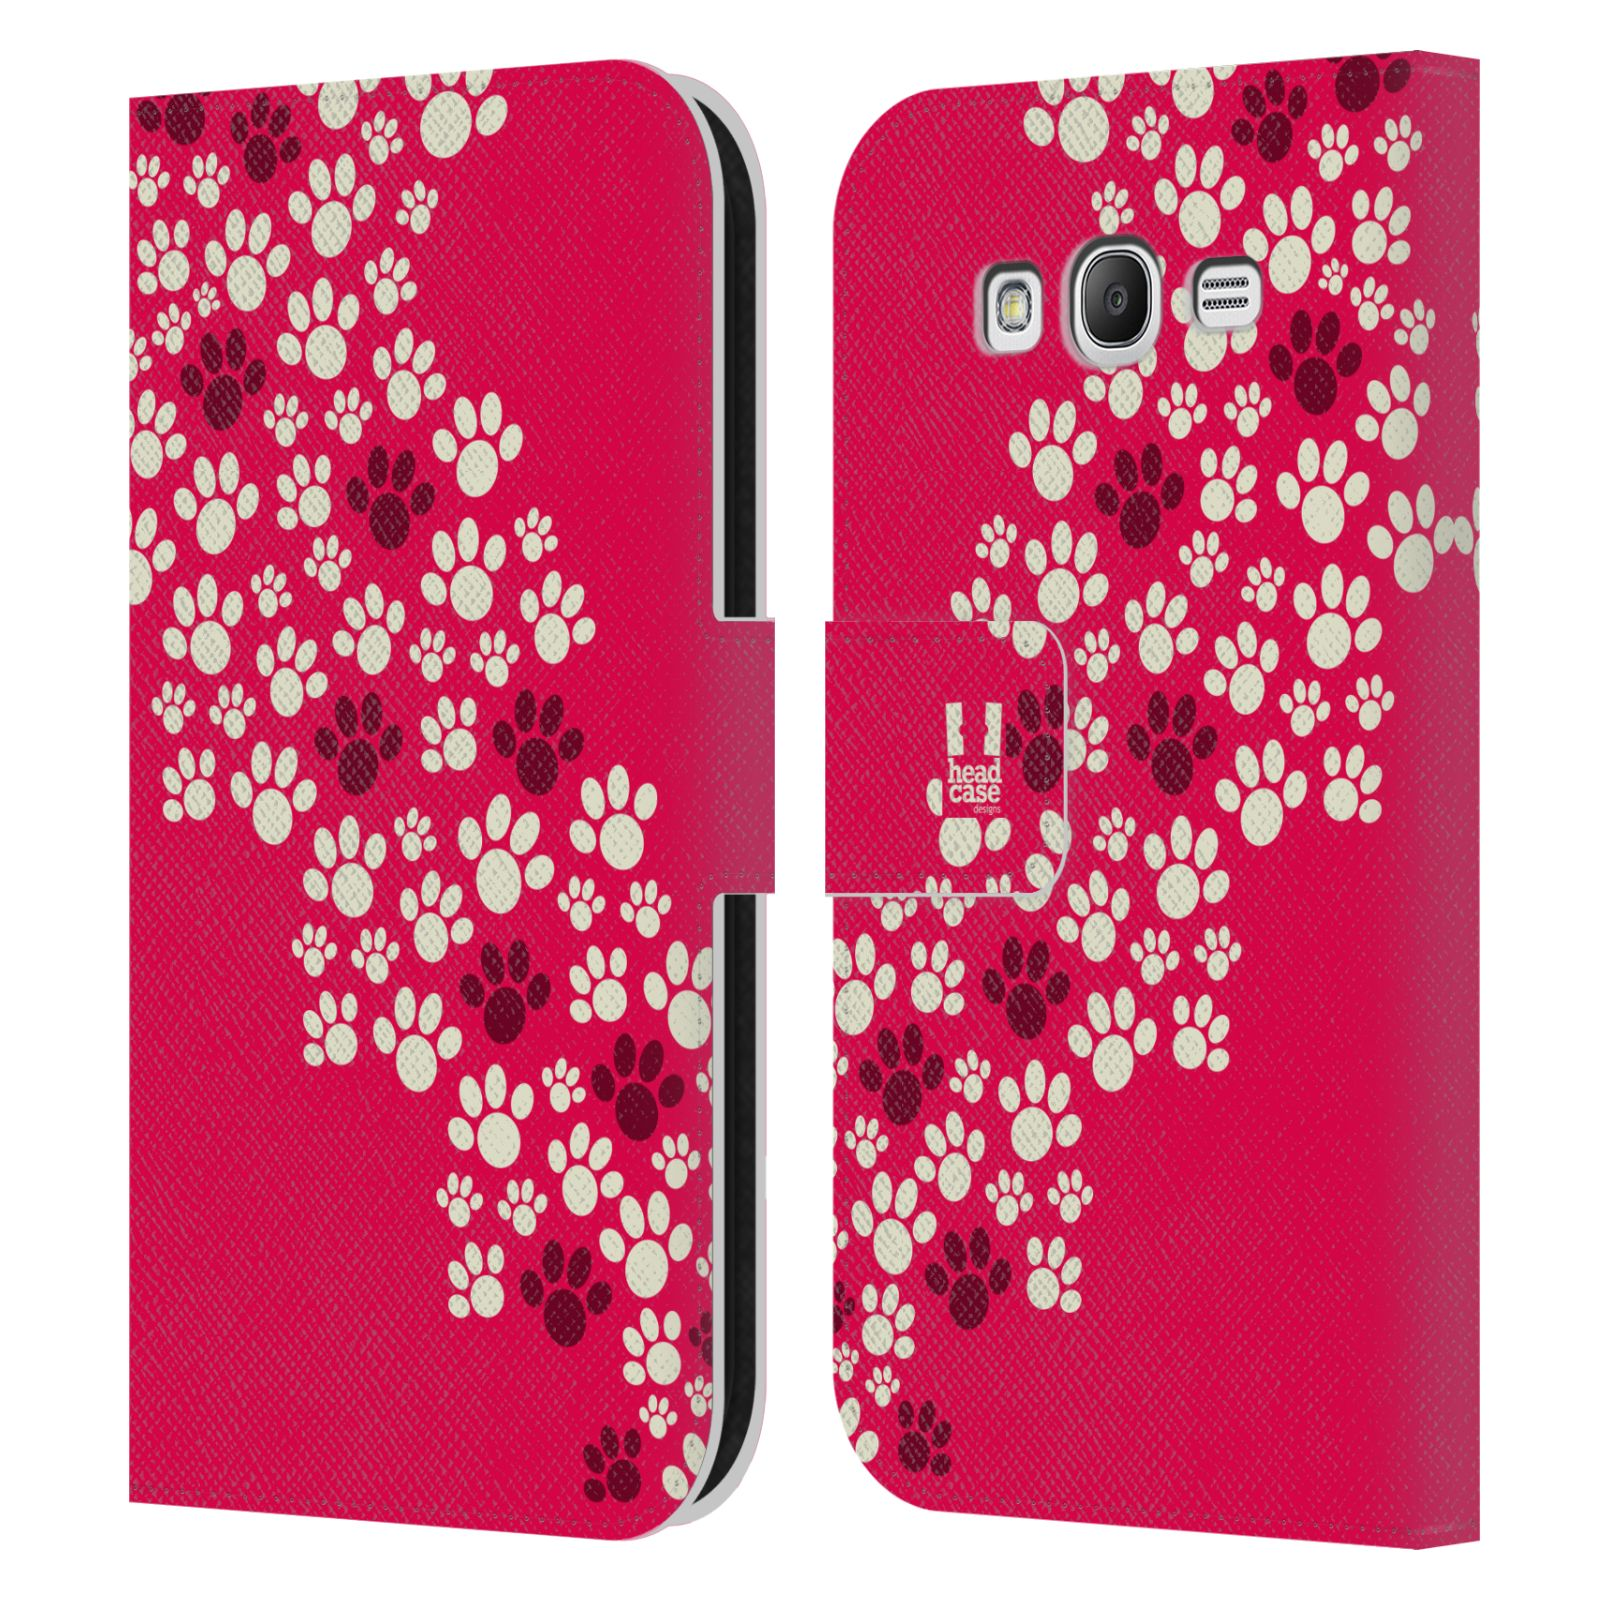 HEAD CASE Flipové pouzdro pro mobil Samsung Galaxy Grand i9080 Pejsek ťapky růžová barva